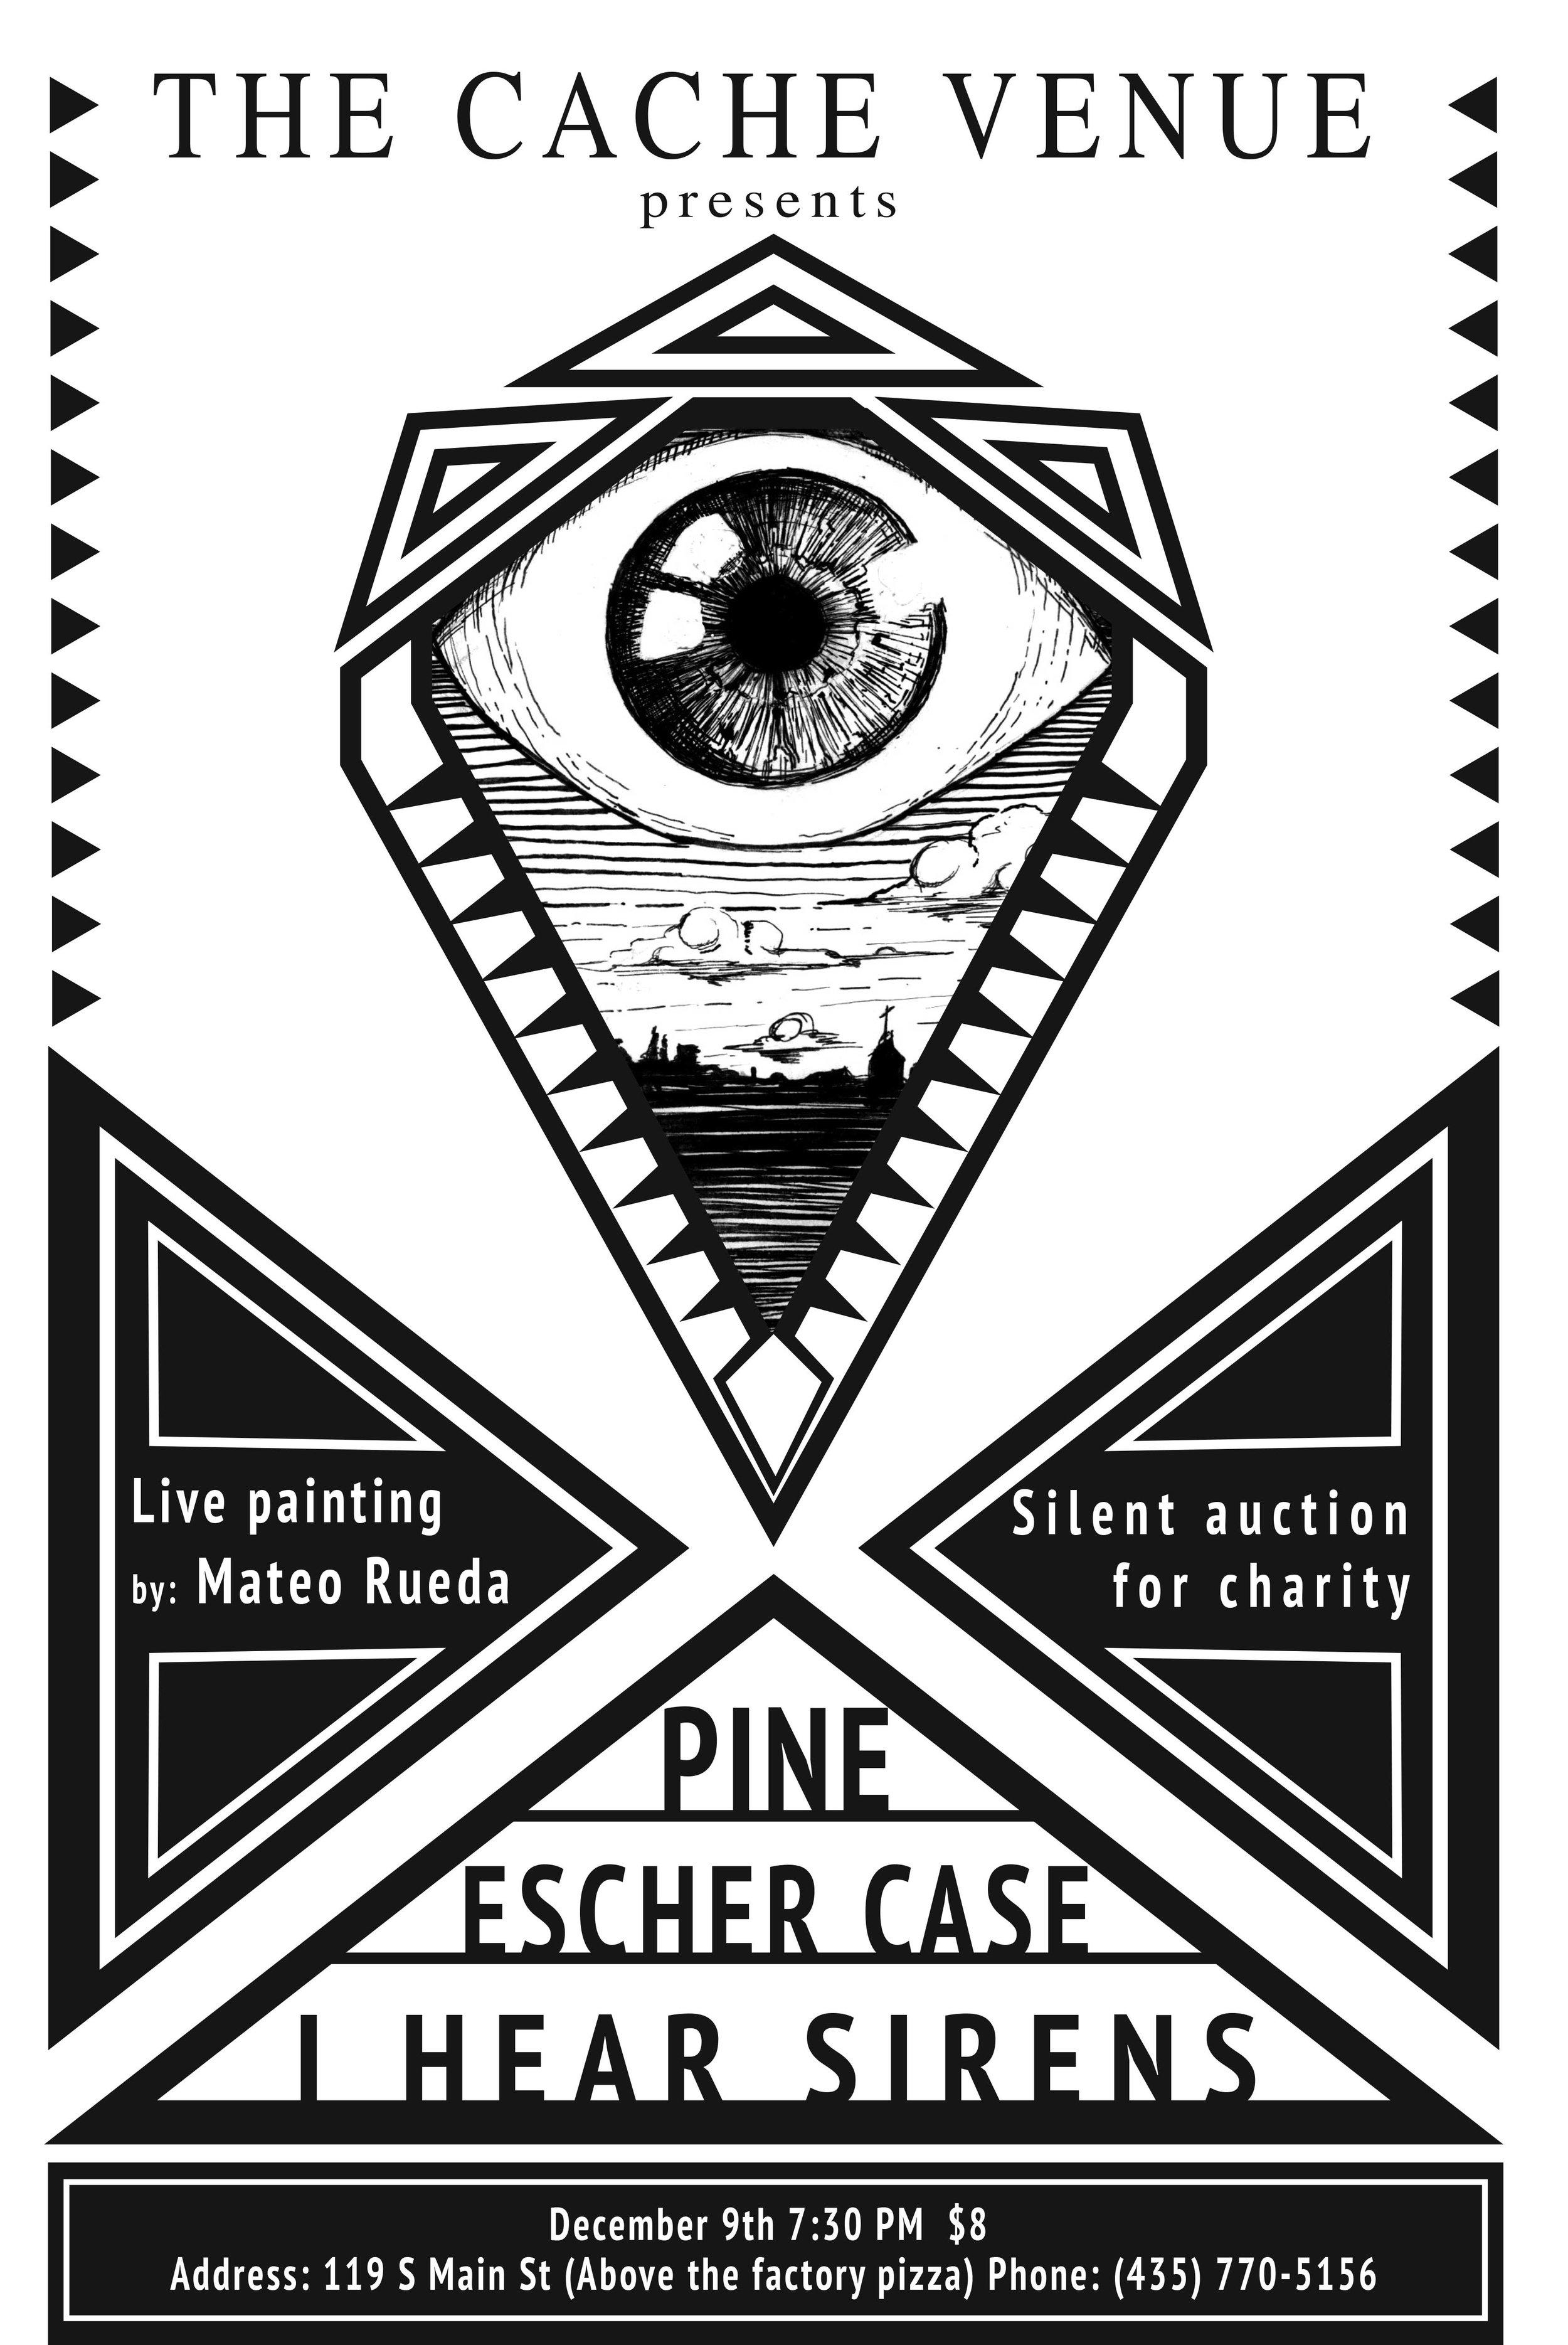 Pine-poster-dec-7-1.jpg